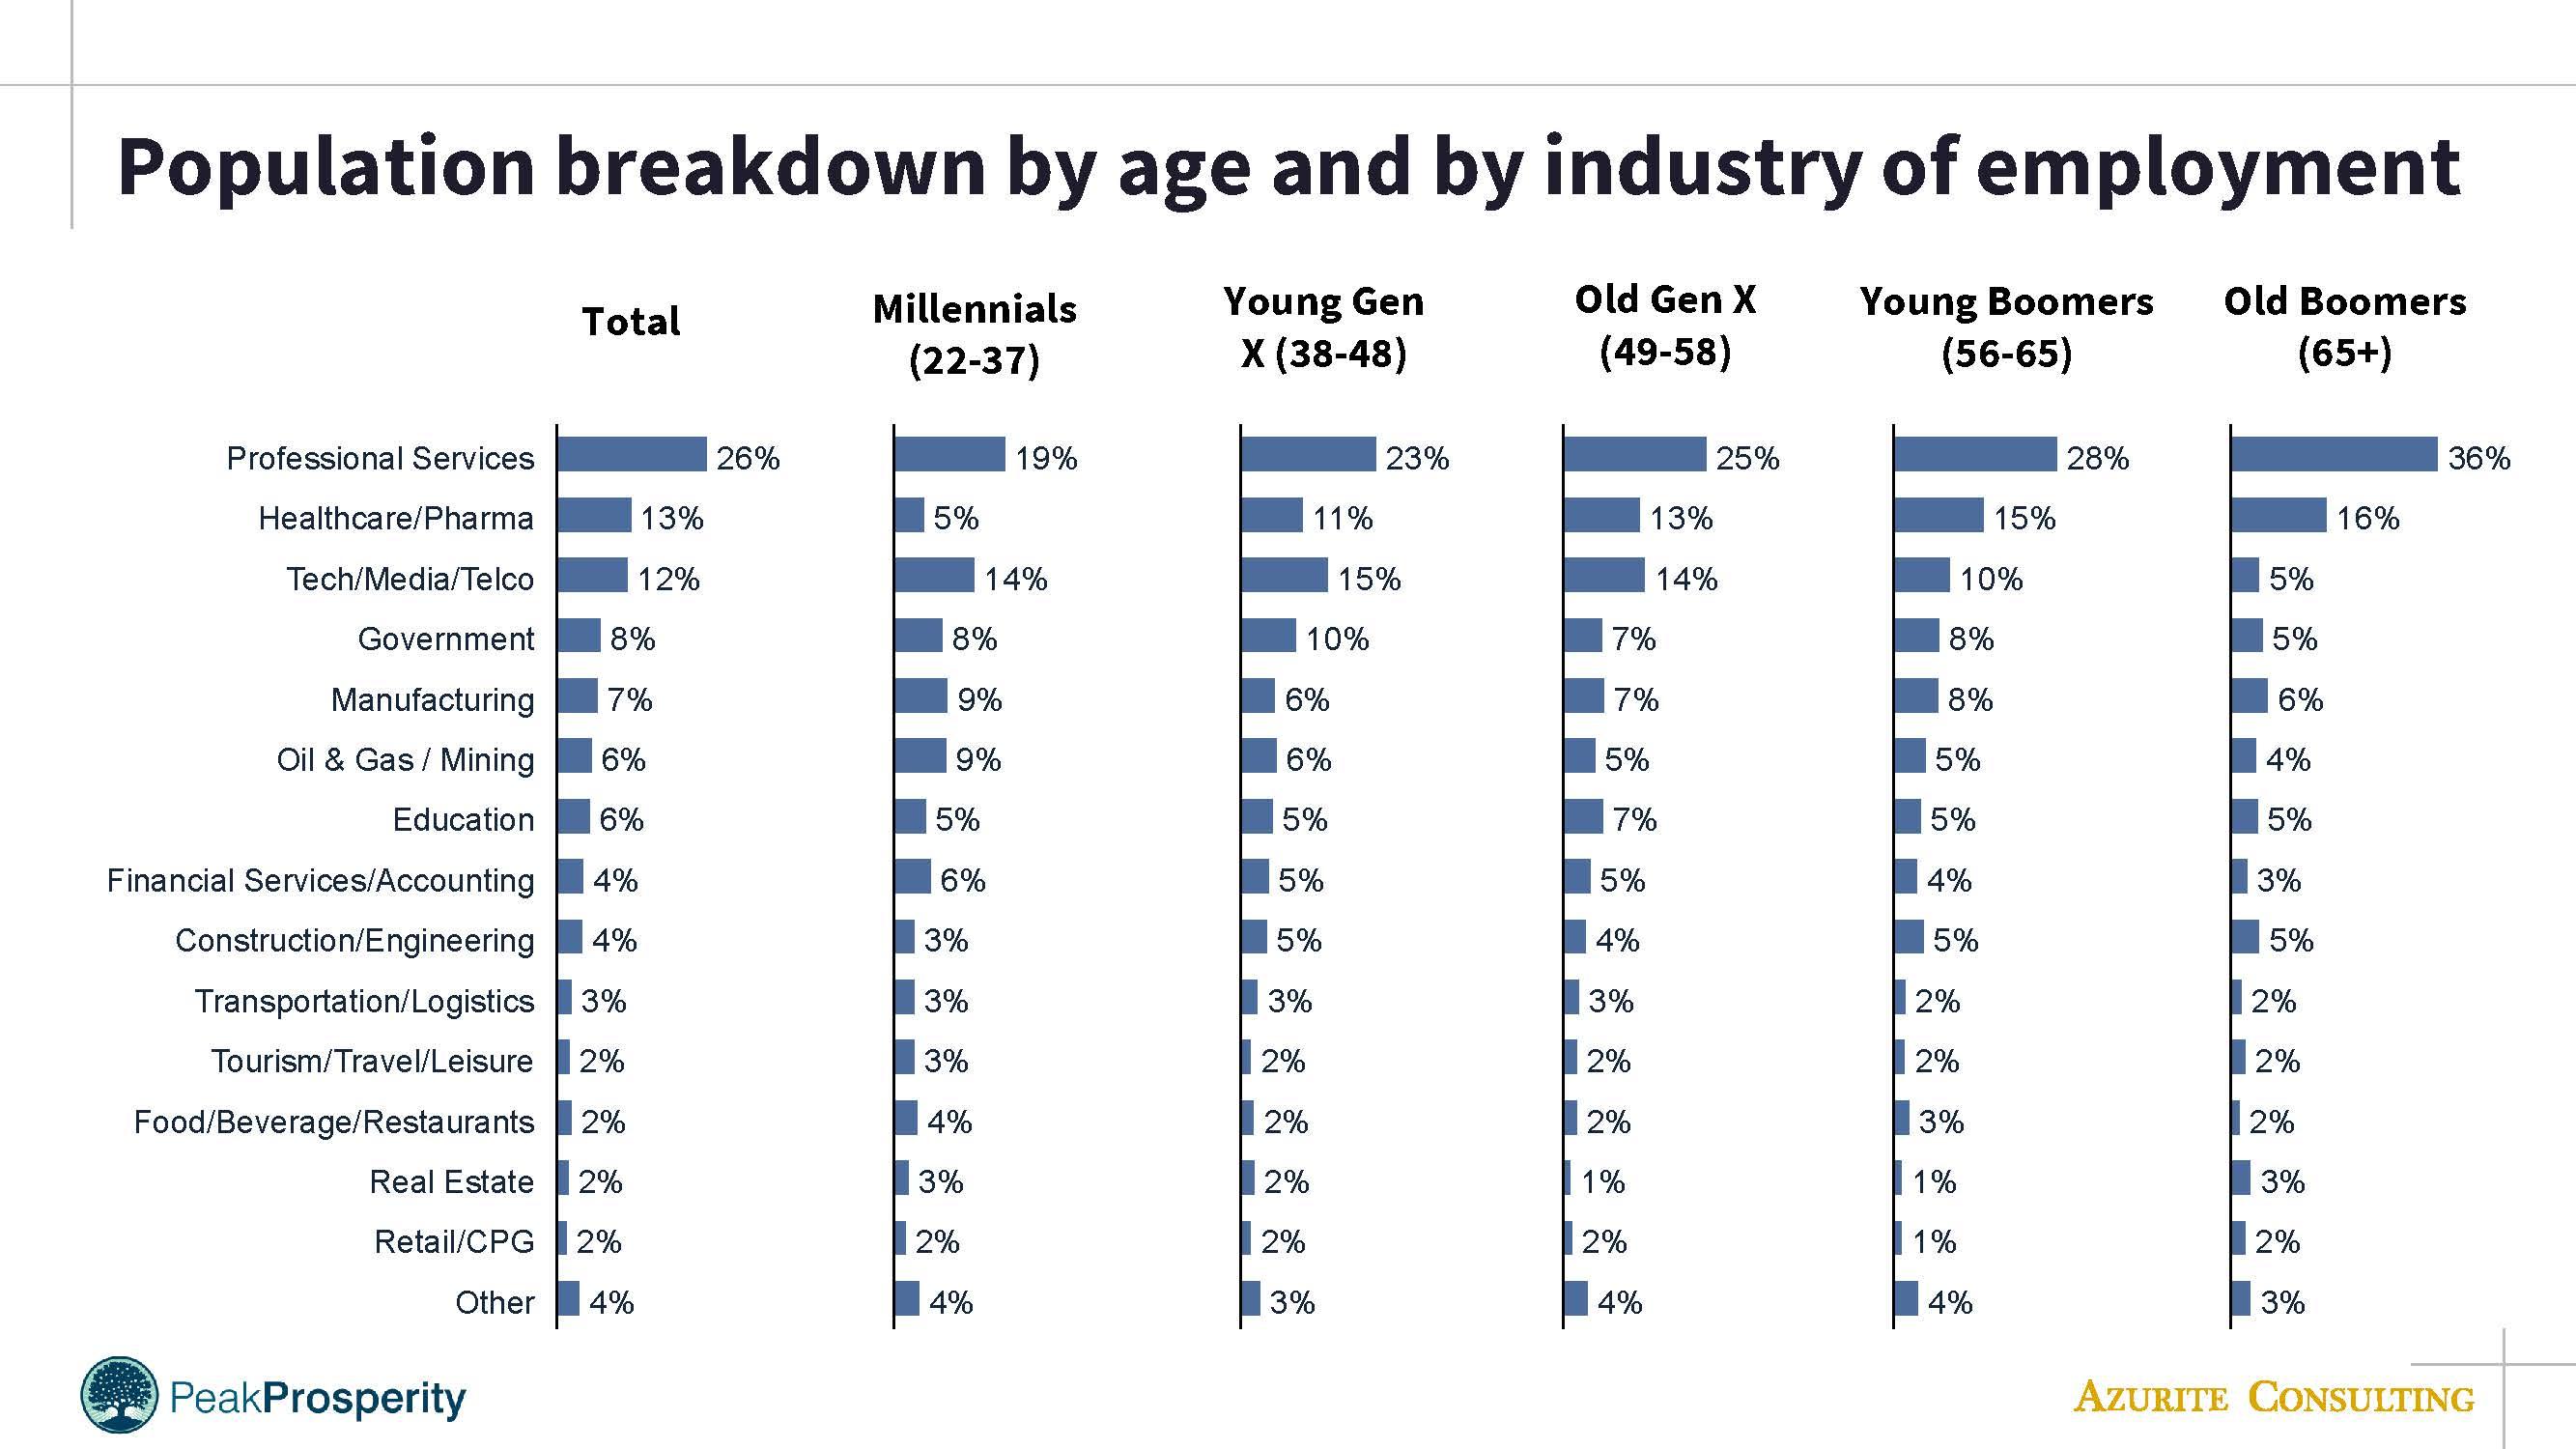 PP population breakdown by age & industry